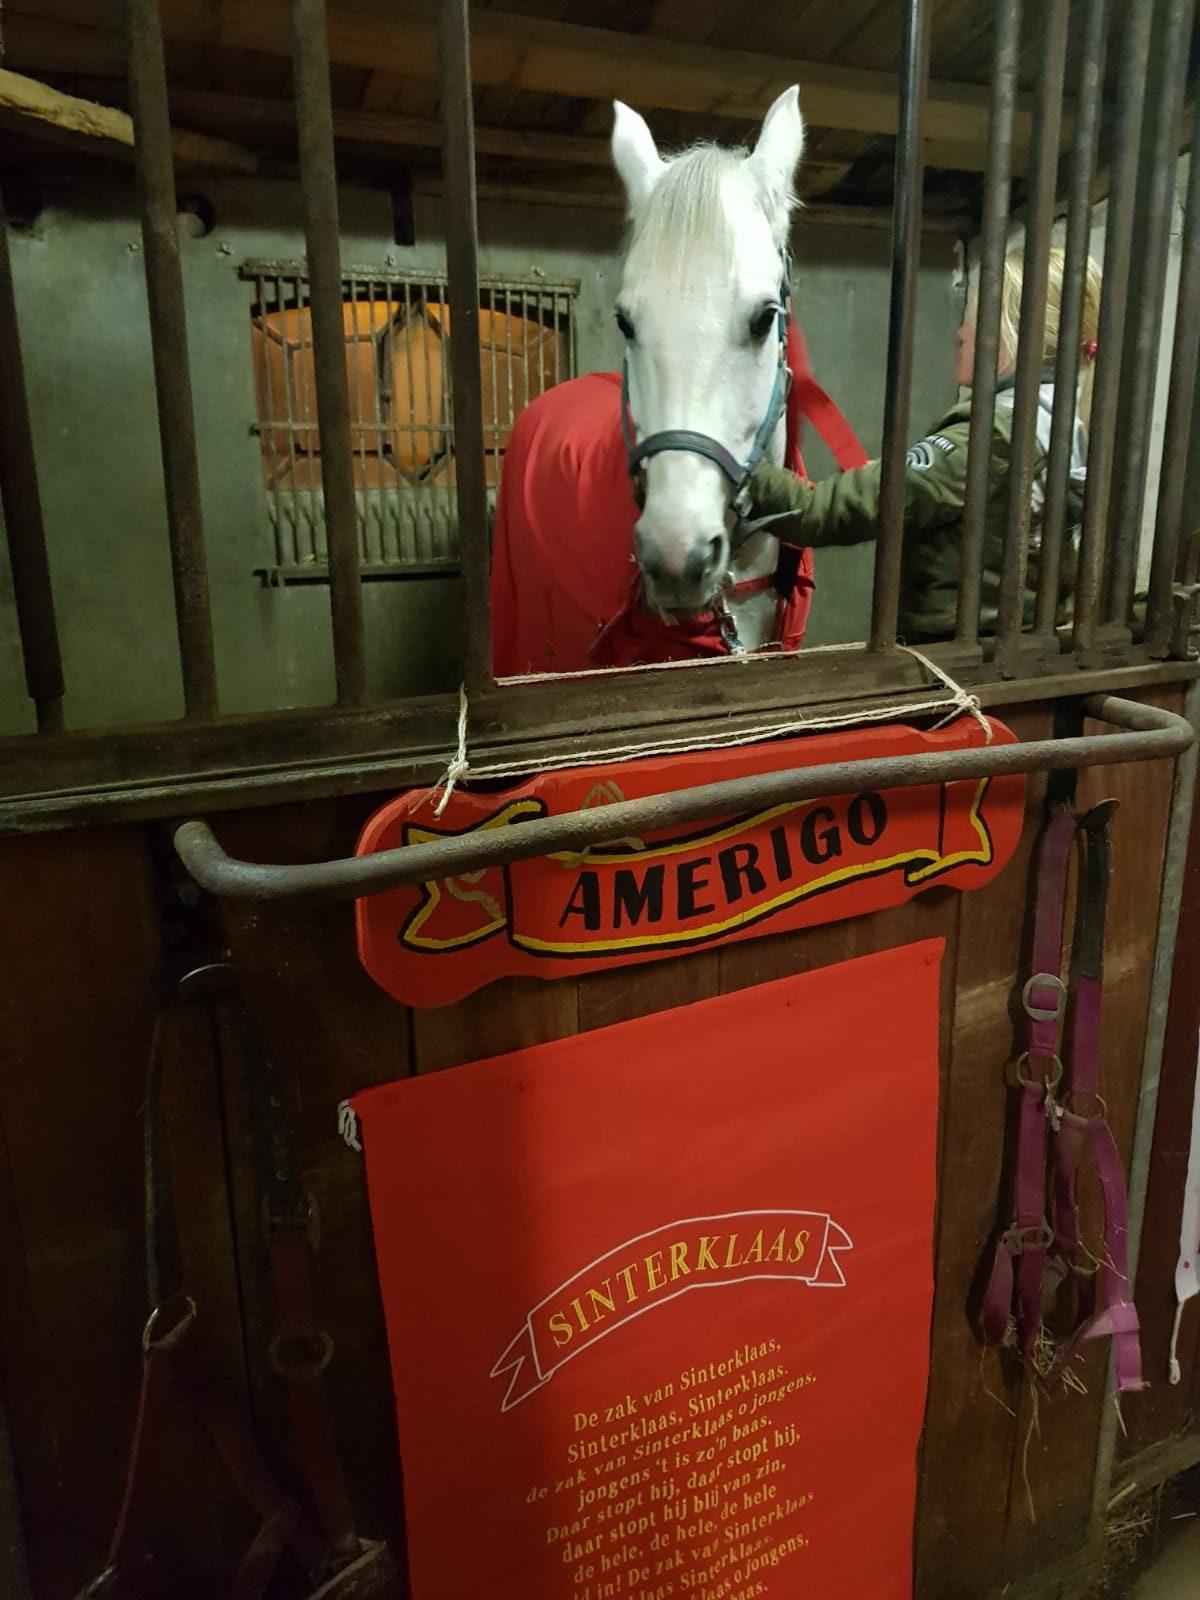 Amerigo, en Sinterklaasintocht Rozenburg